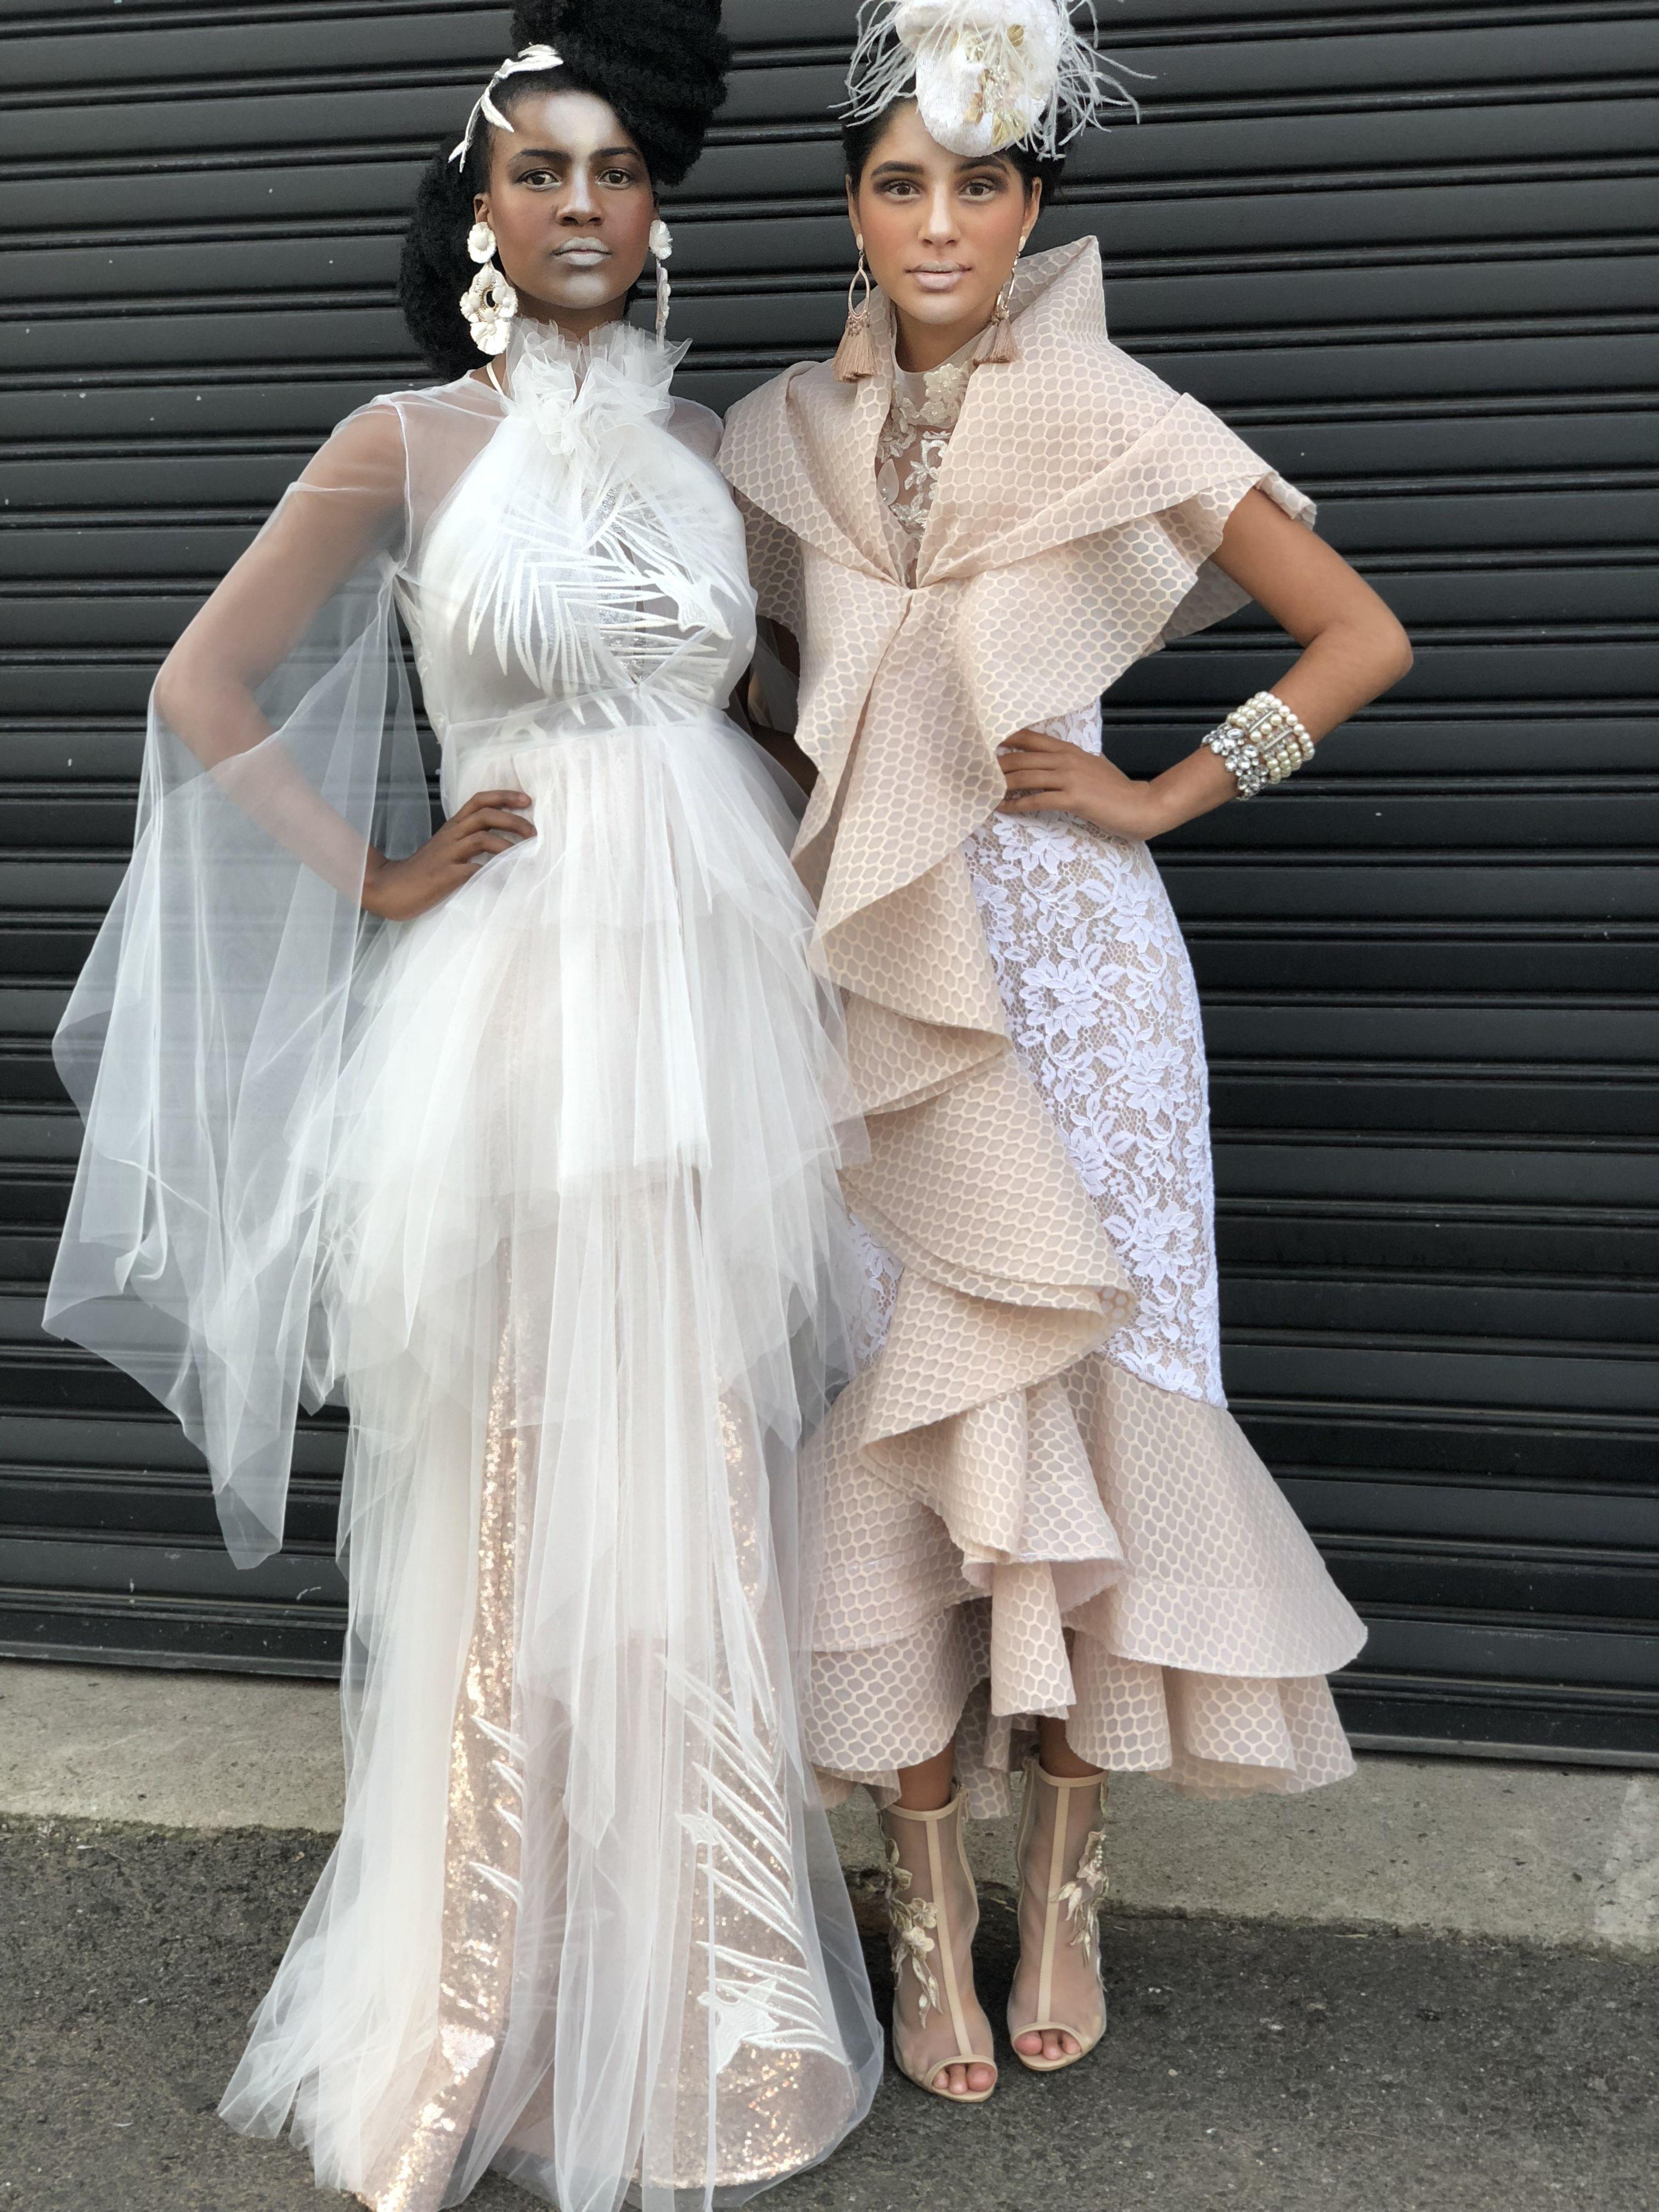 Durban July 2018 Invited Designer Showcase the